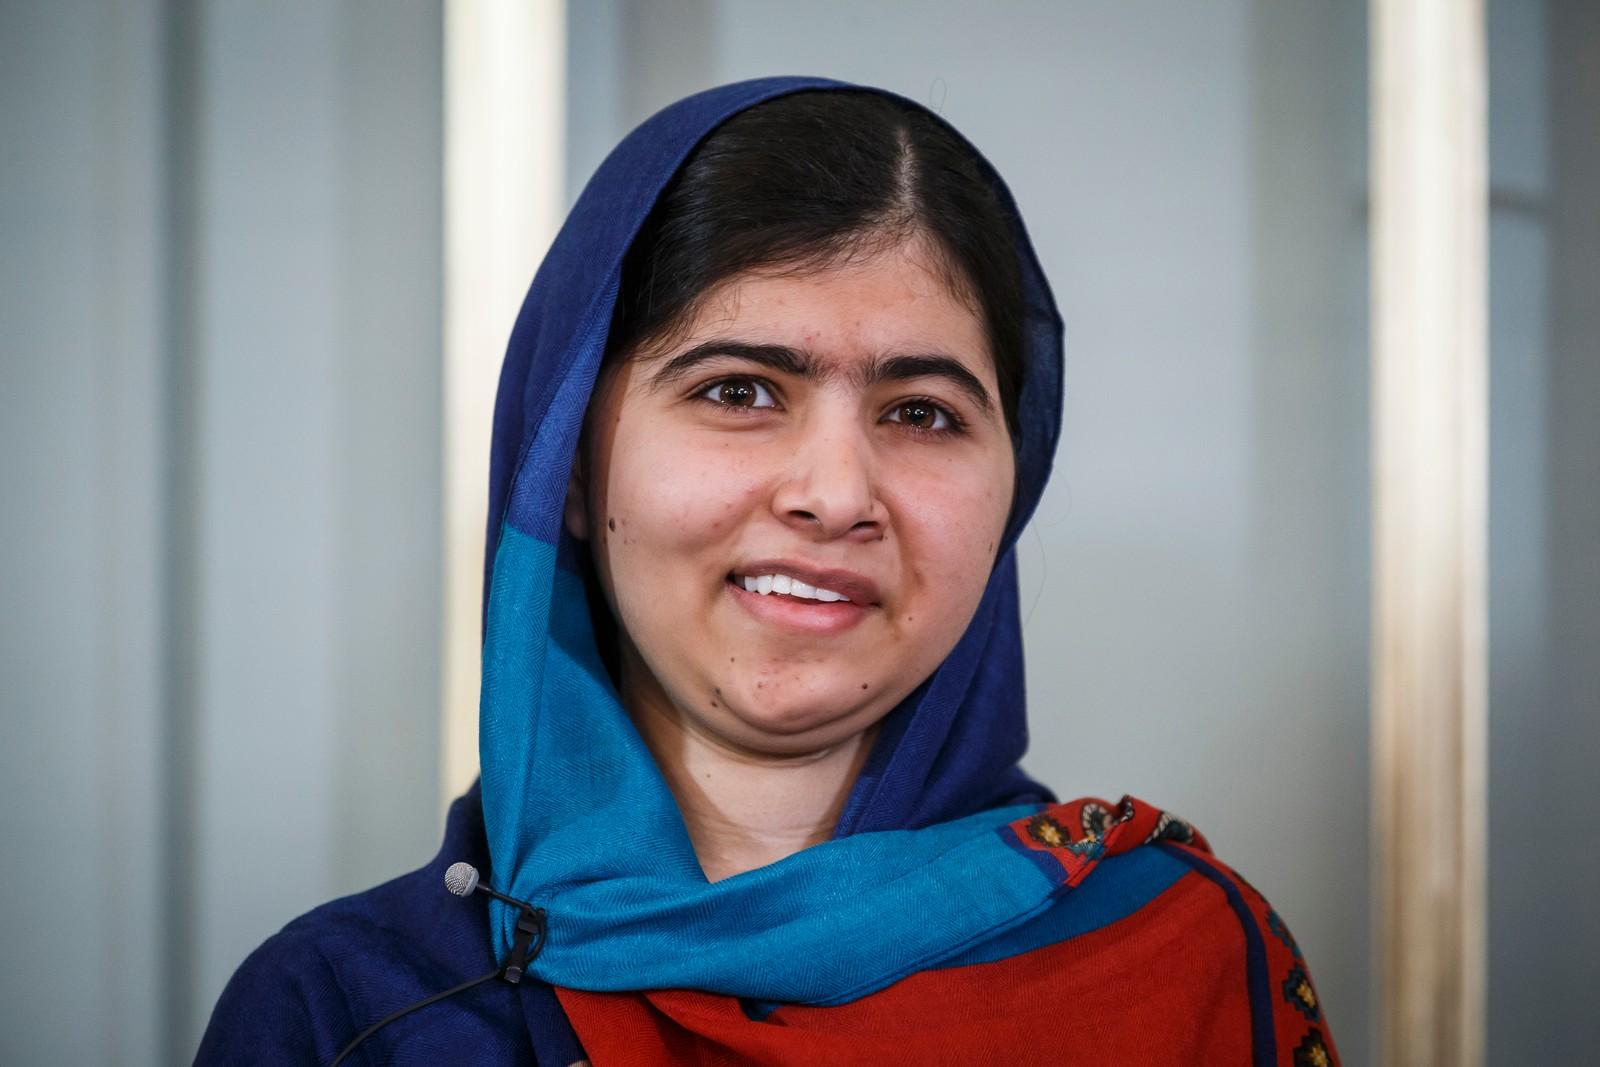 9. DESEMBER: Fredsprisvinnerne Kailash Satyarthi og Malala Yousafzai holdt en pressekonferanse på Nobel Instituttet tirsdag. Malala sa blant annet at fredsprisen har gjort henne sterkere.